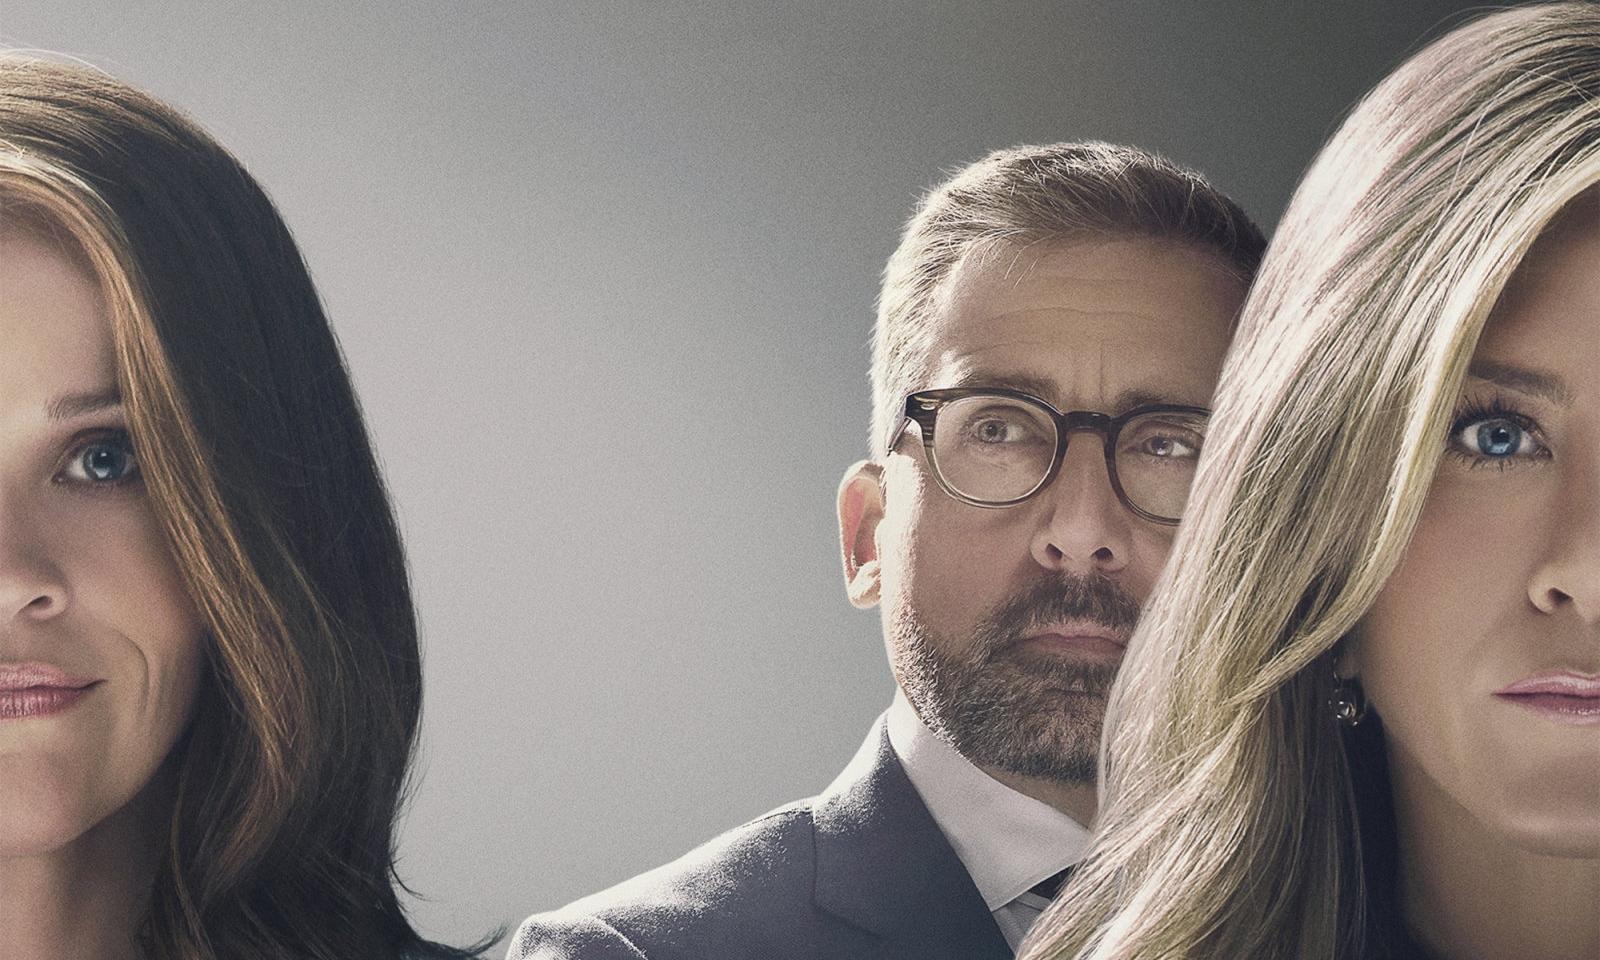 Apple TV+ 剧集《早间新闻》第二季发布先导预告